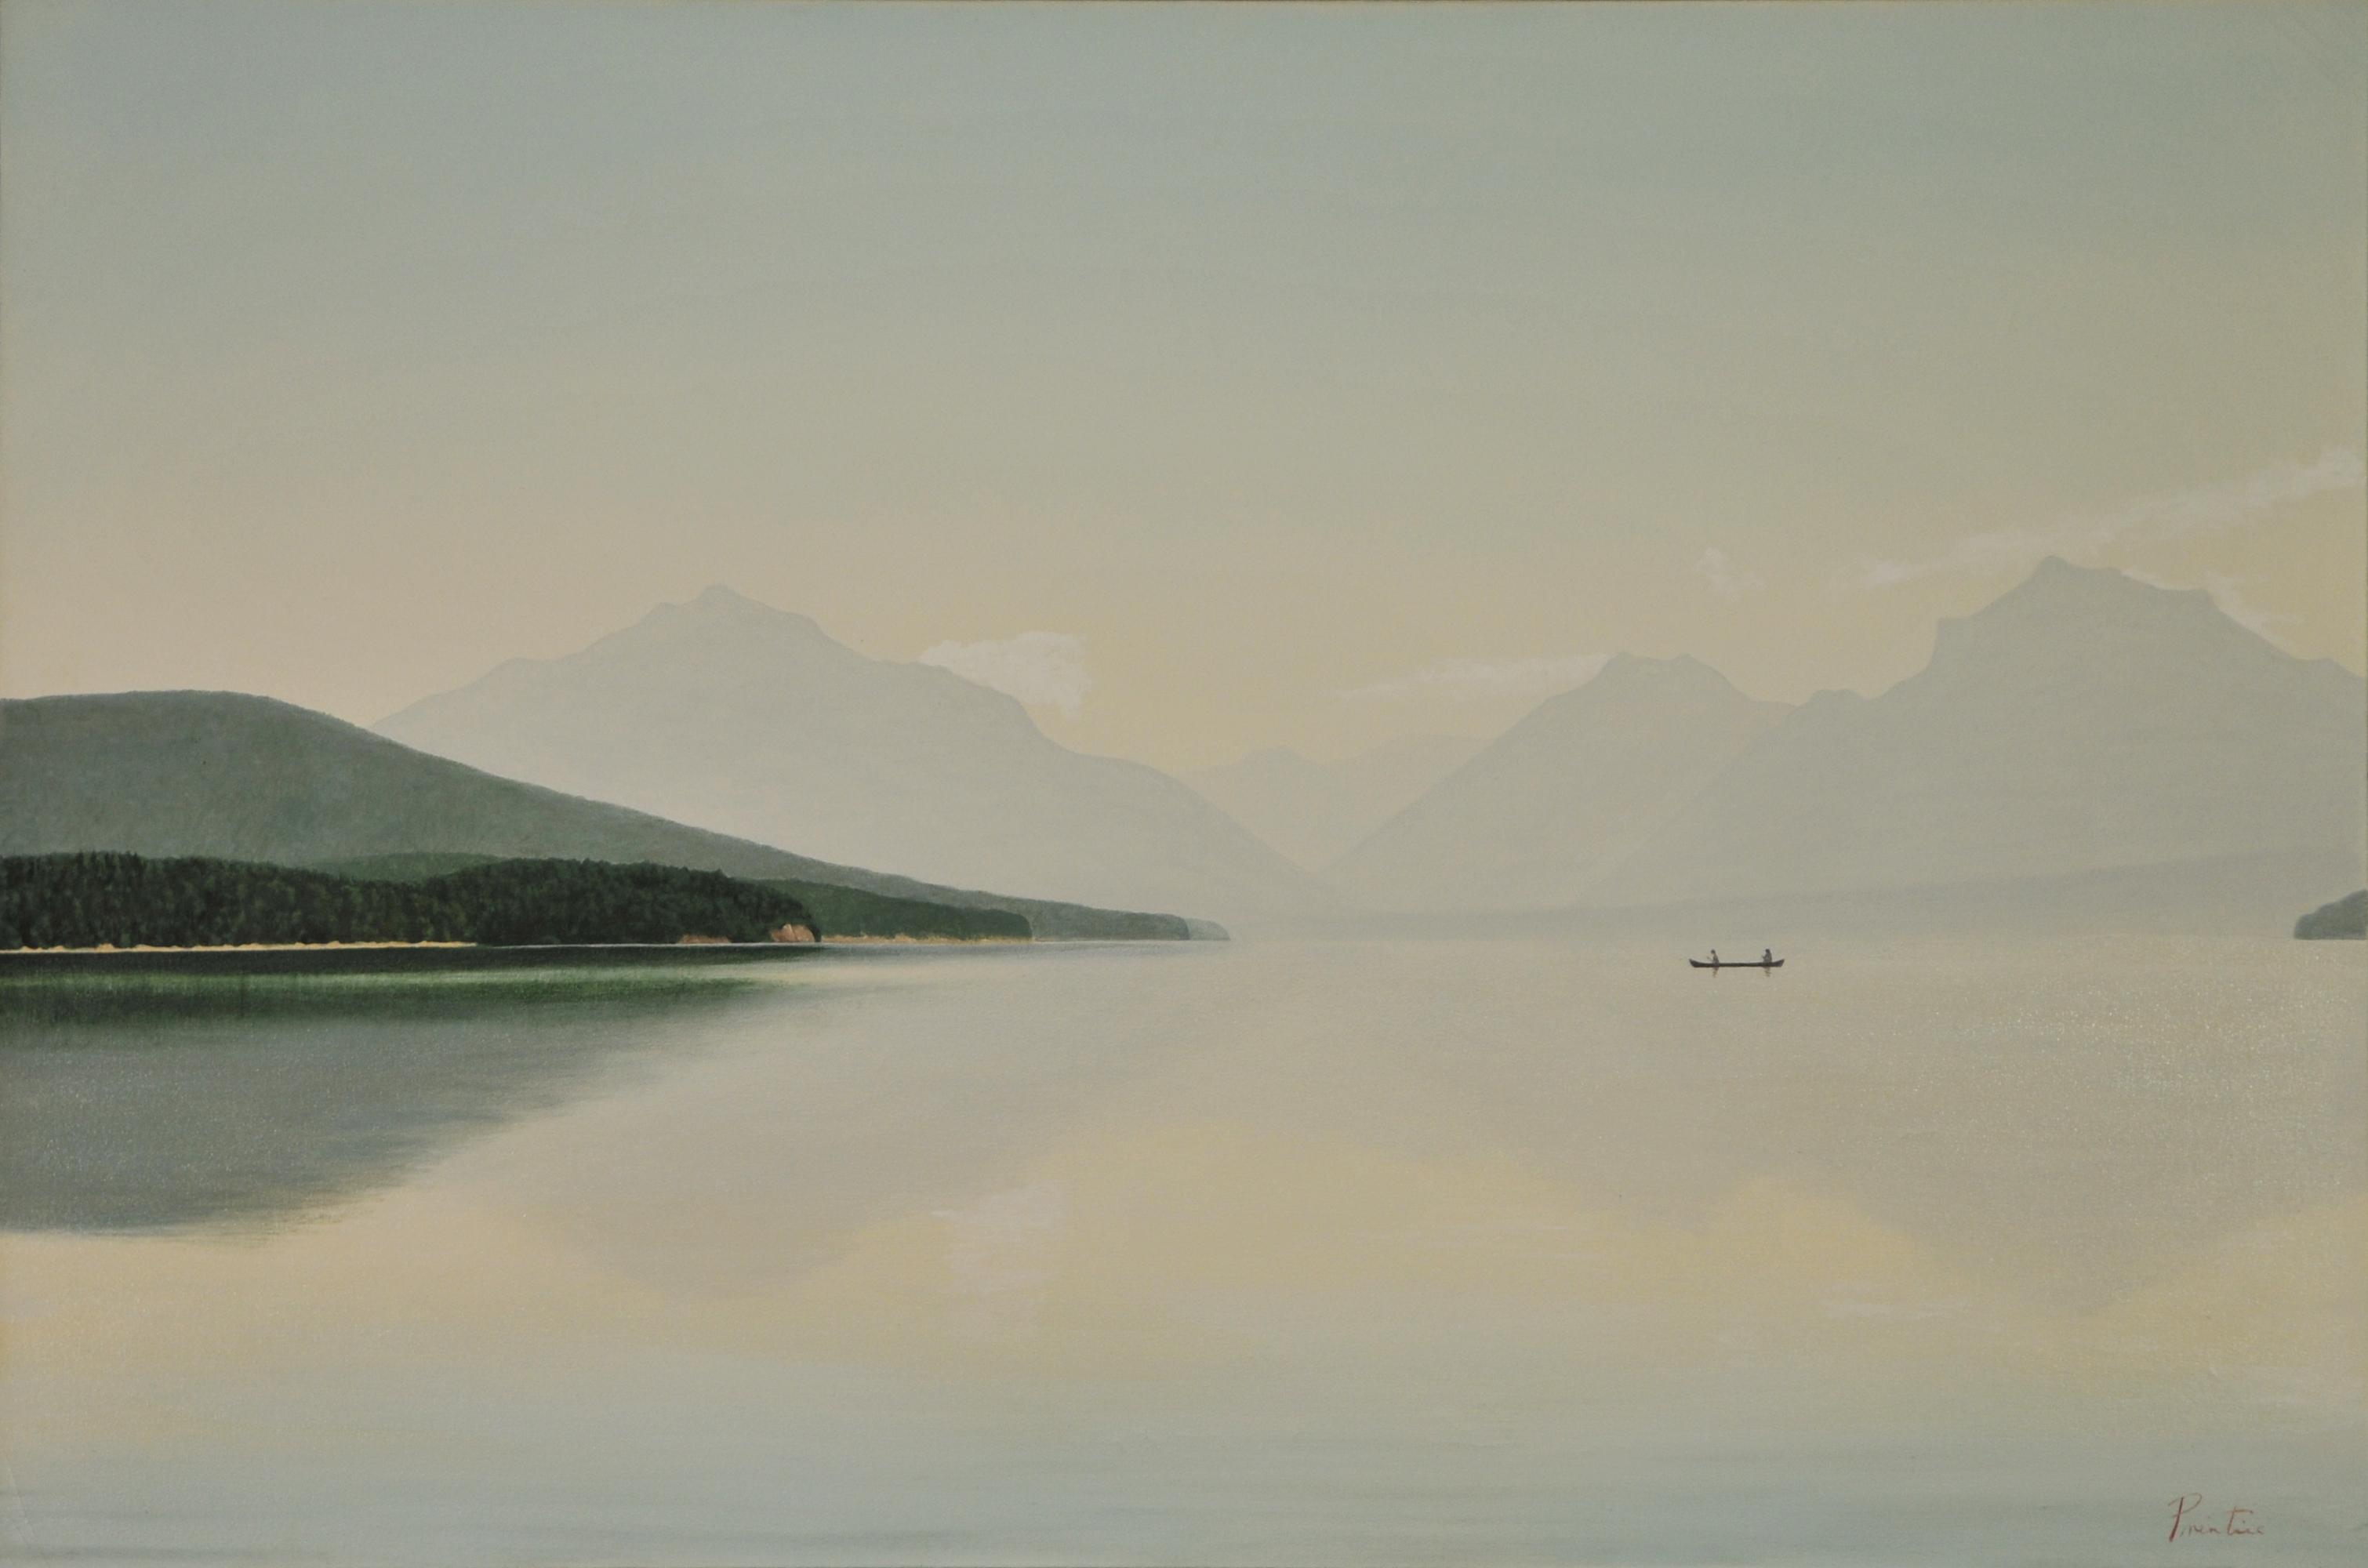 David Prentice, Ancient Silence